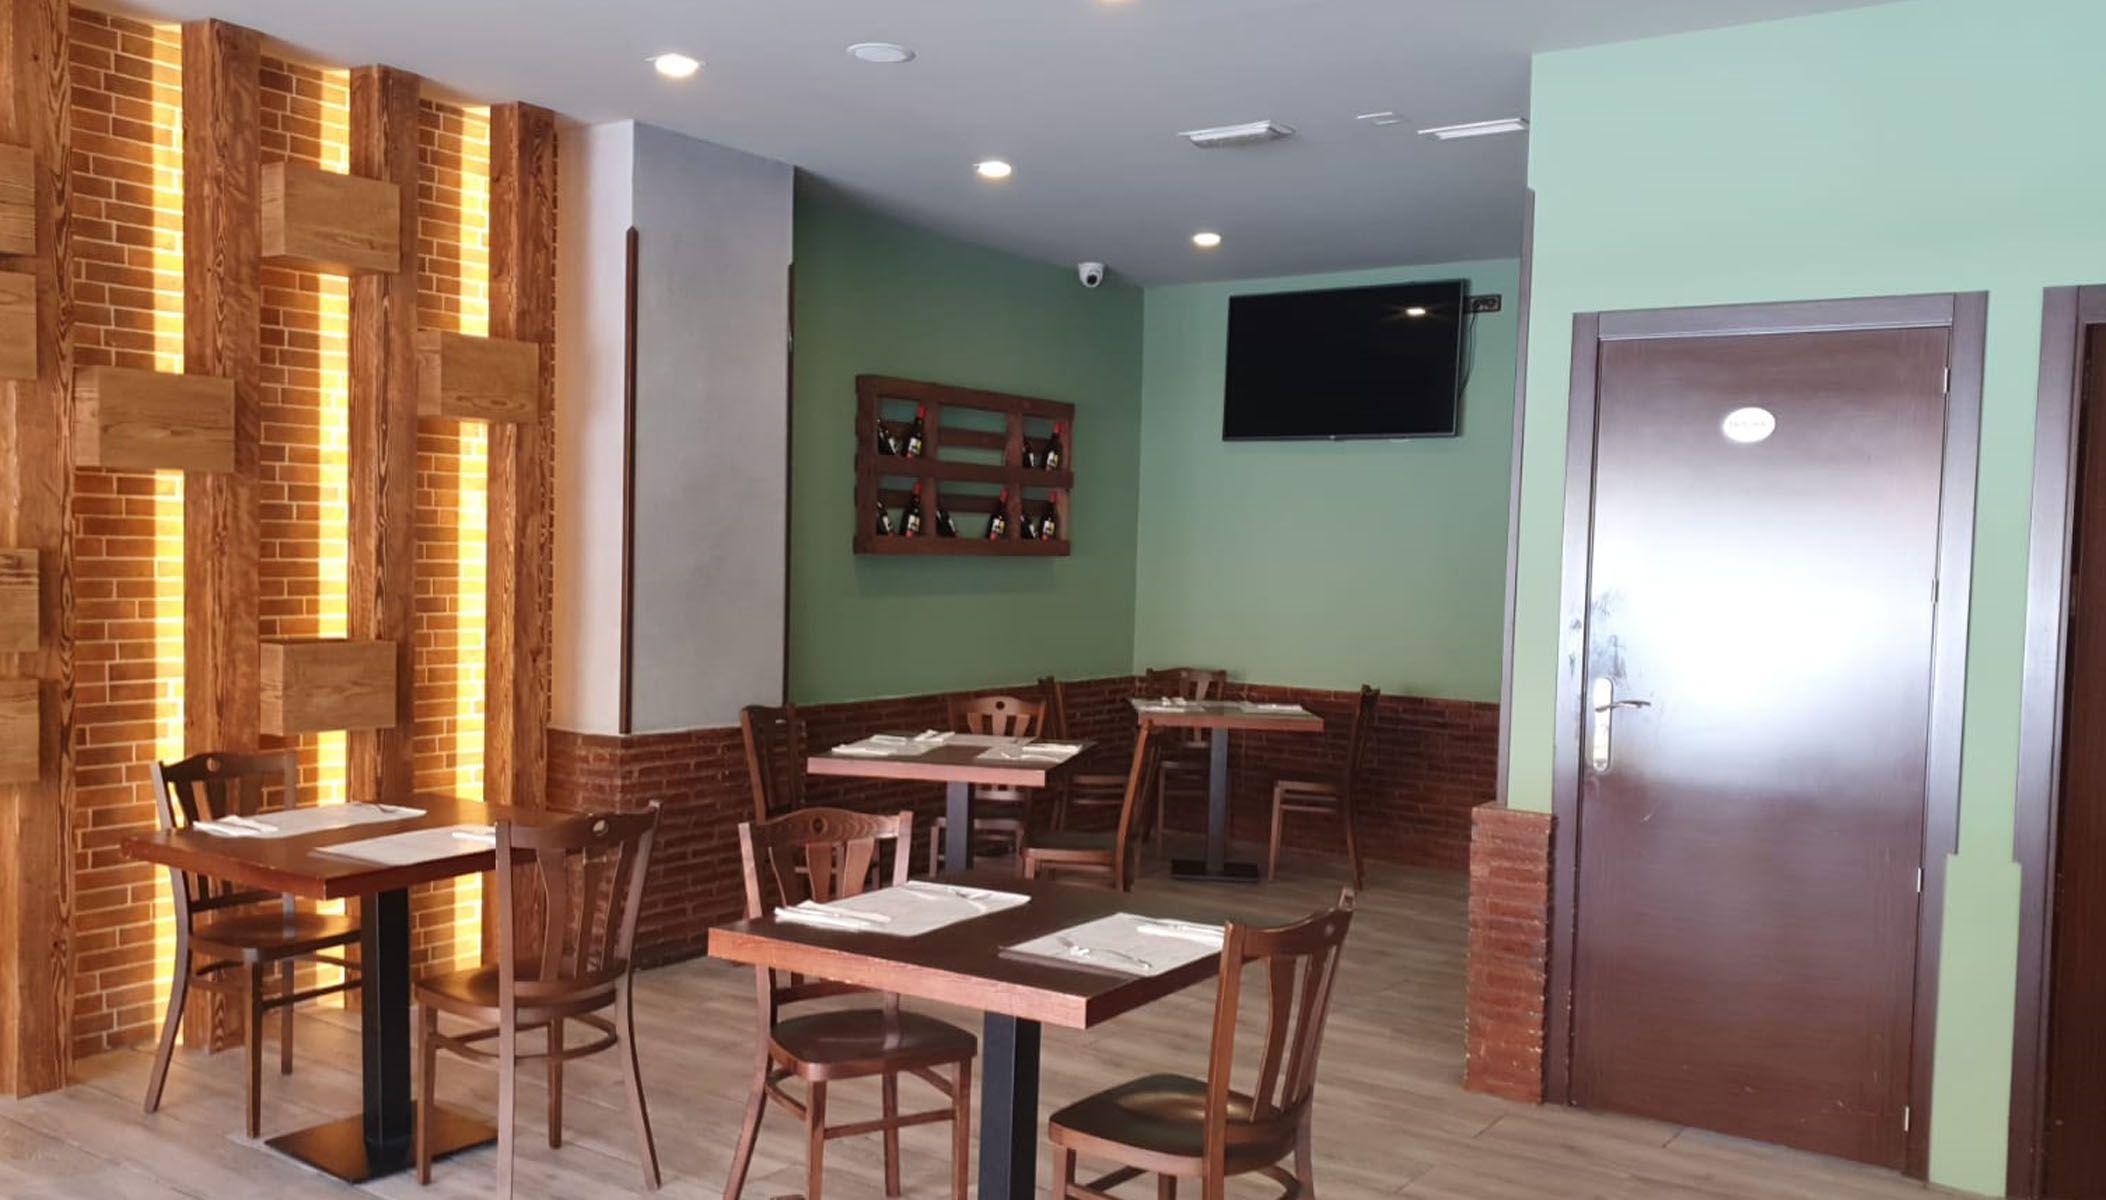 Restaurante comida casera en Carabanchel